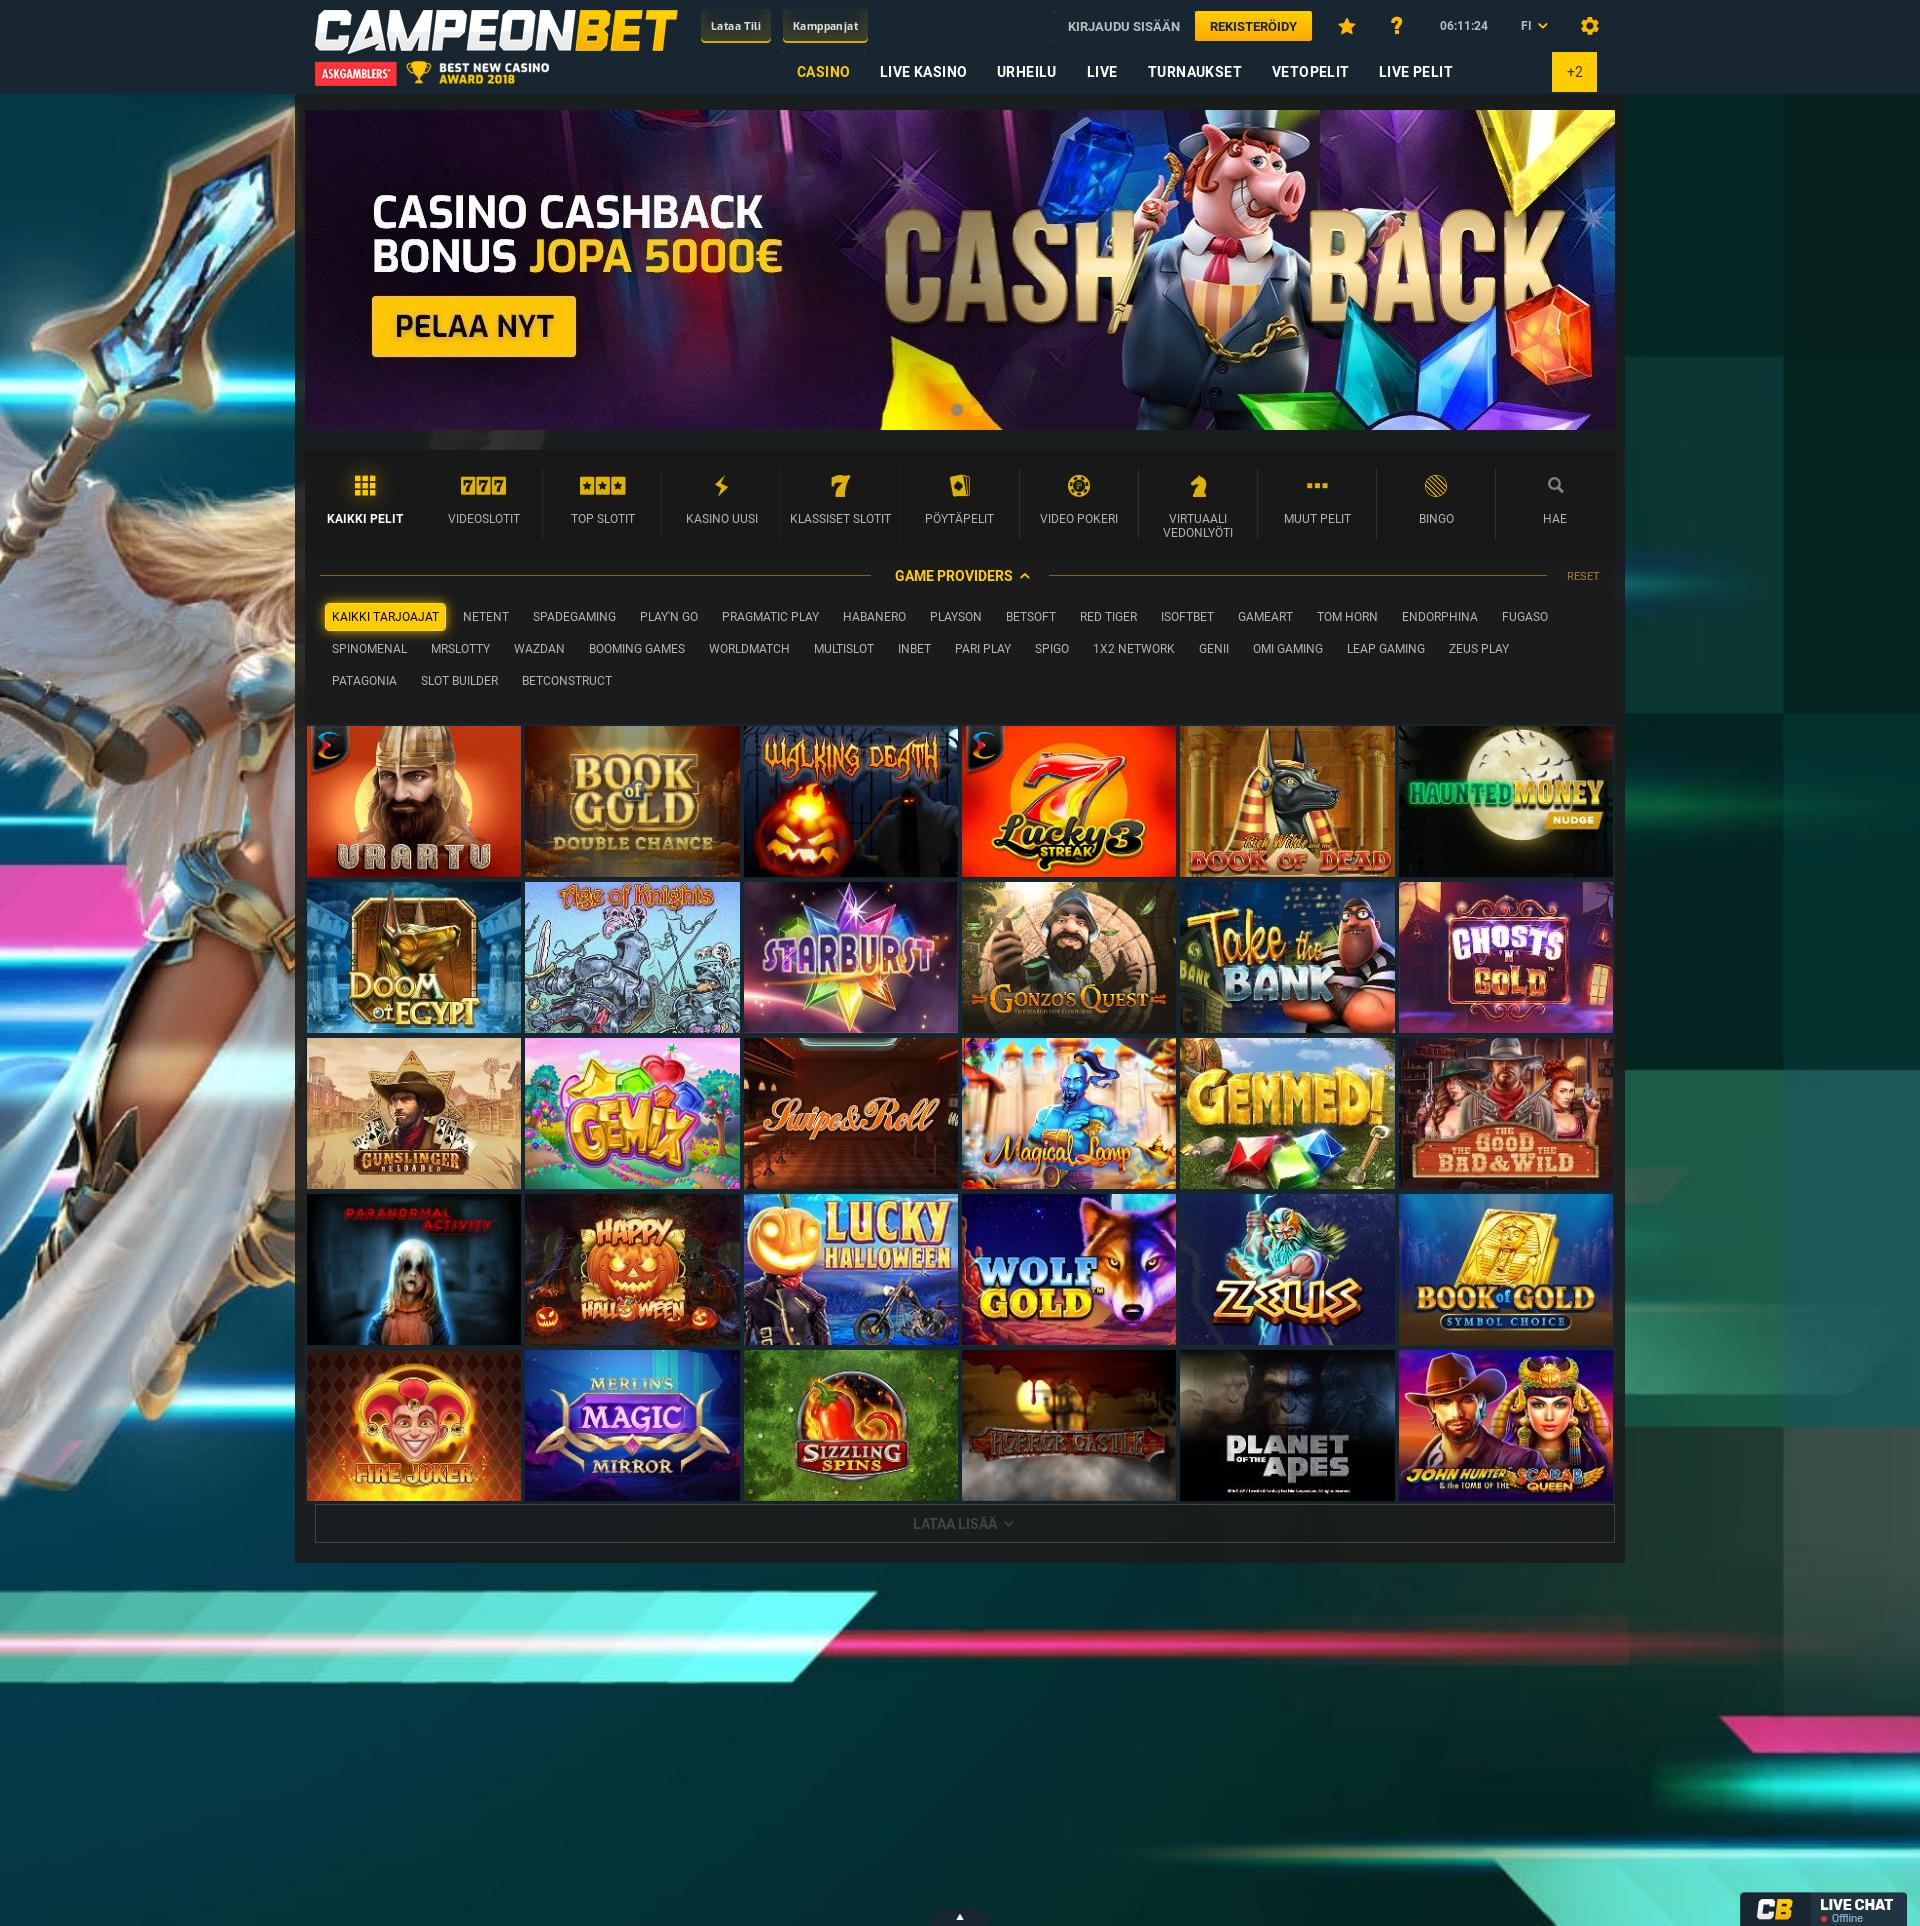 Casino screen Lobby 2019-11-14 for Finland